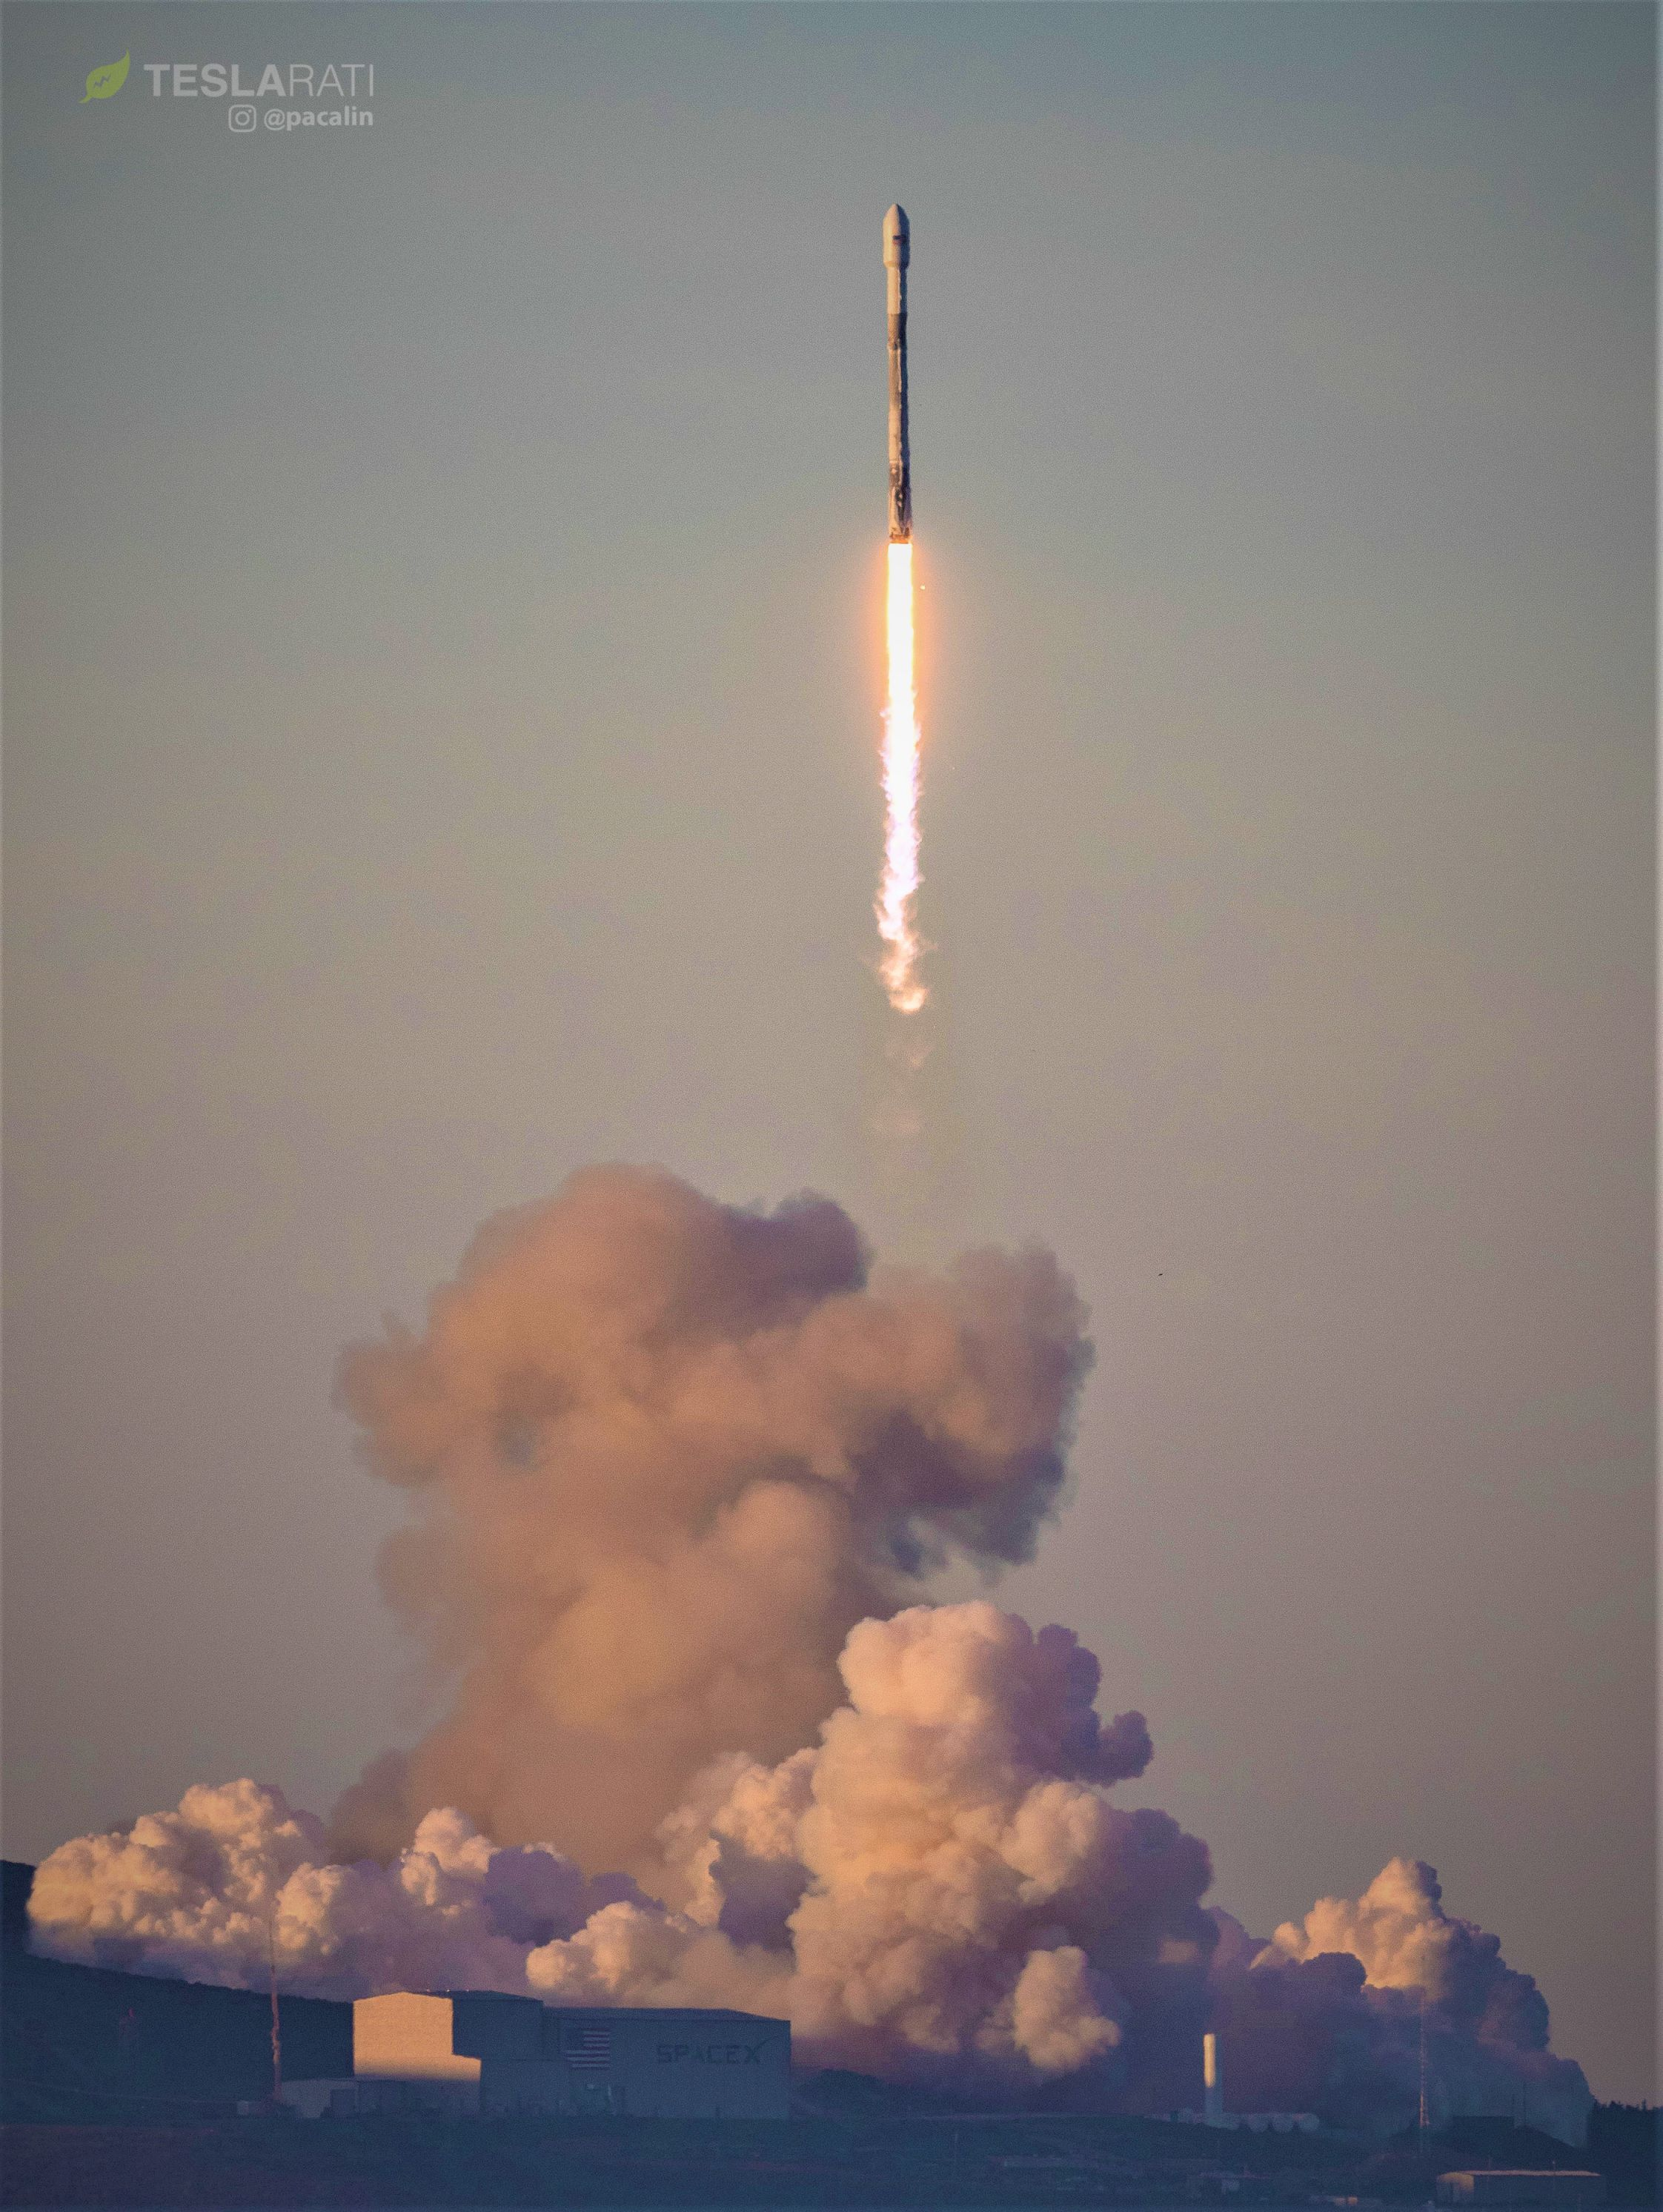 Falcon 9 1041 soars into sunlight (Pauline Acalin)(c)